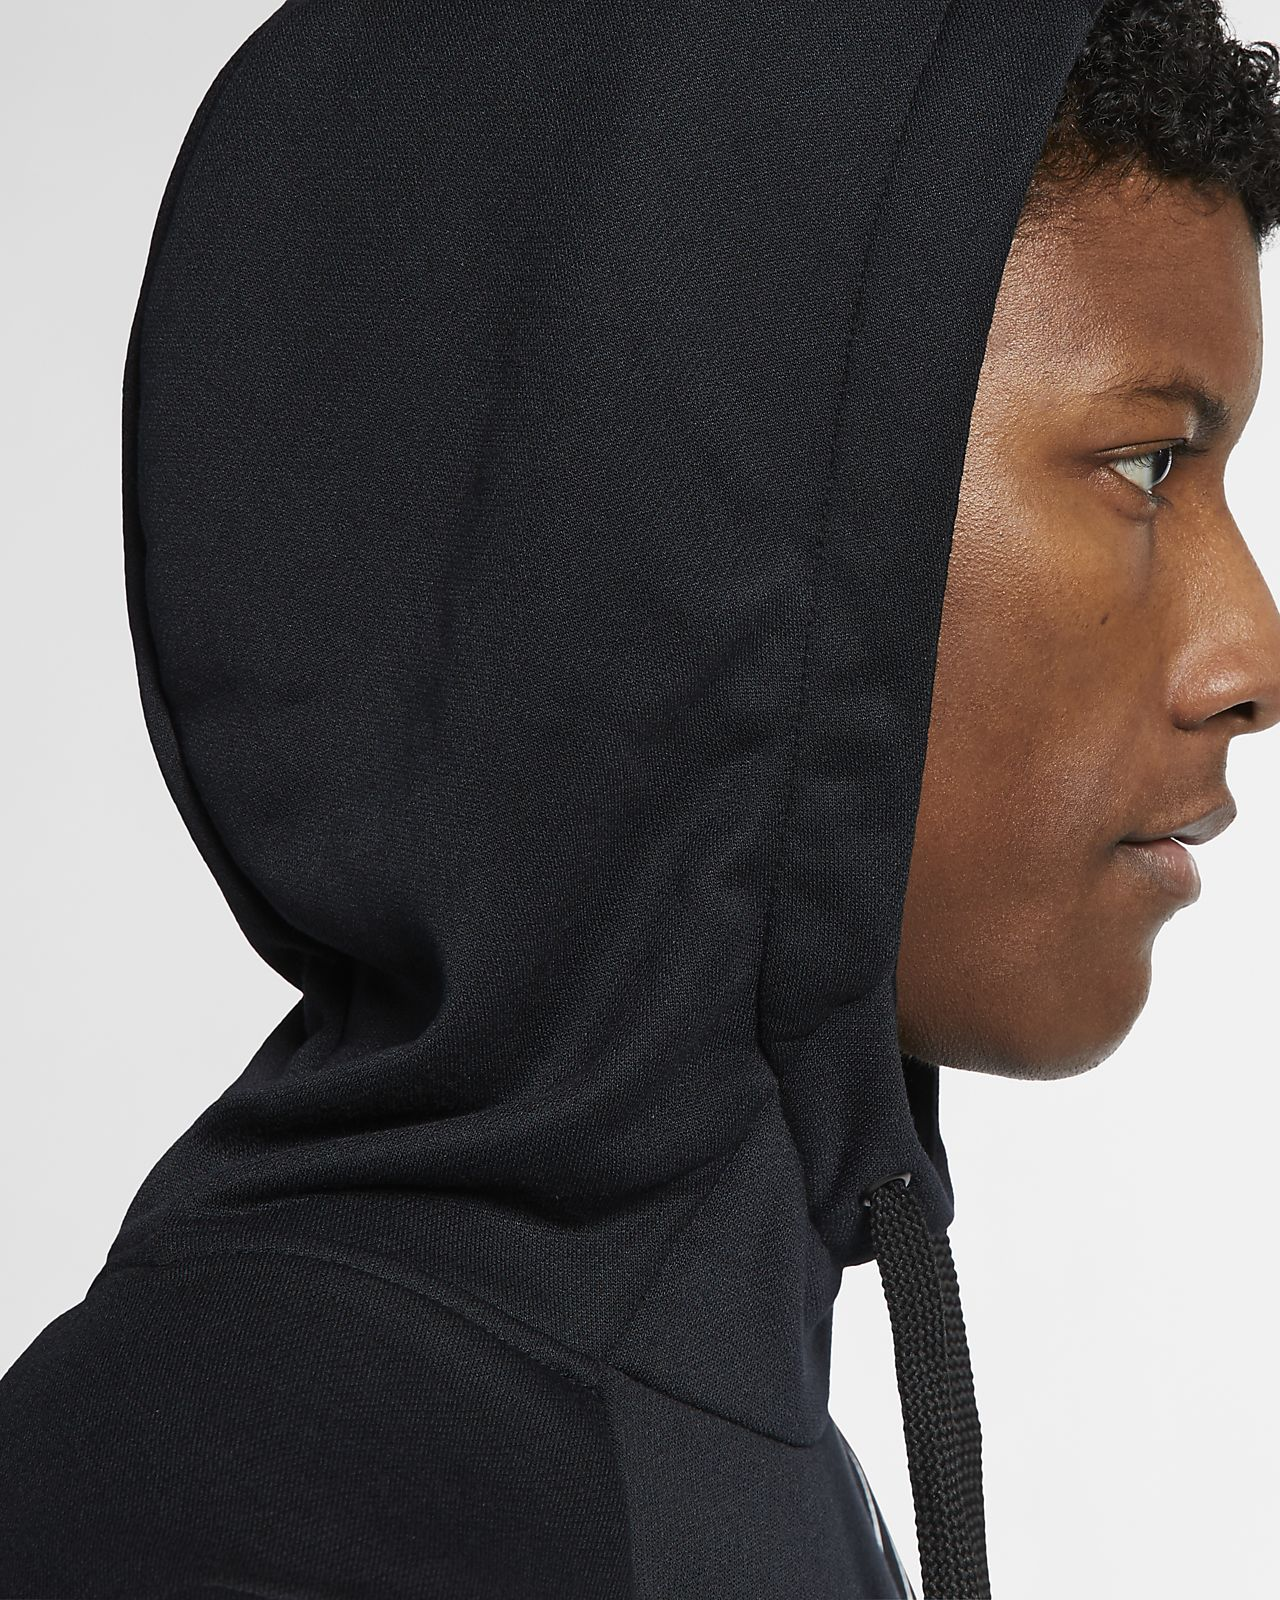 d2c5d7be748ef1 Nike Dri-FIT Men s Sleeveless Training Hoodie. Nike.com CA